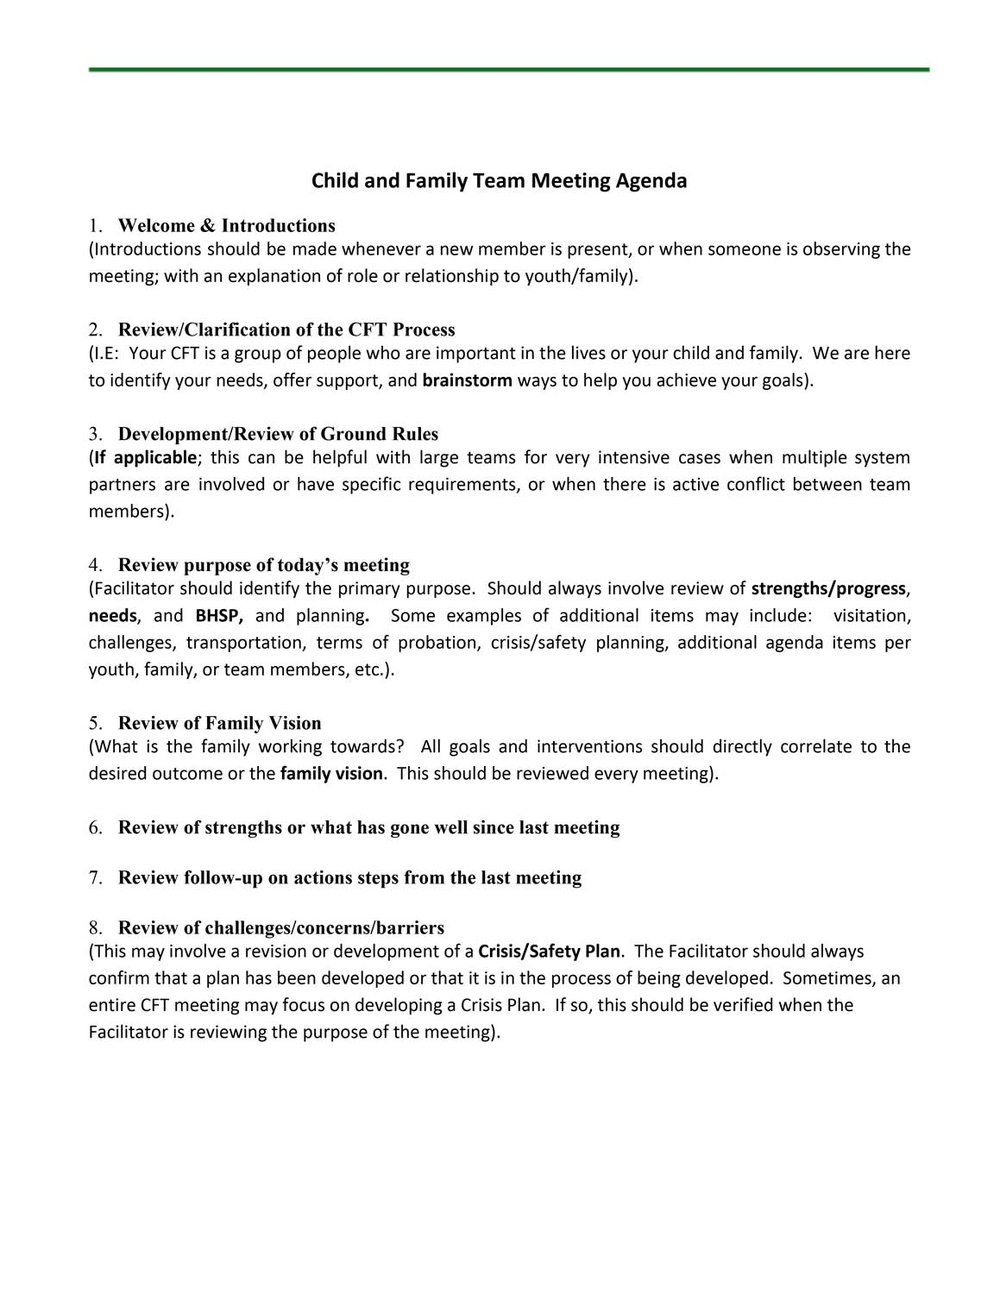 Agenda_Page-1.jpg